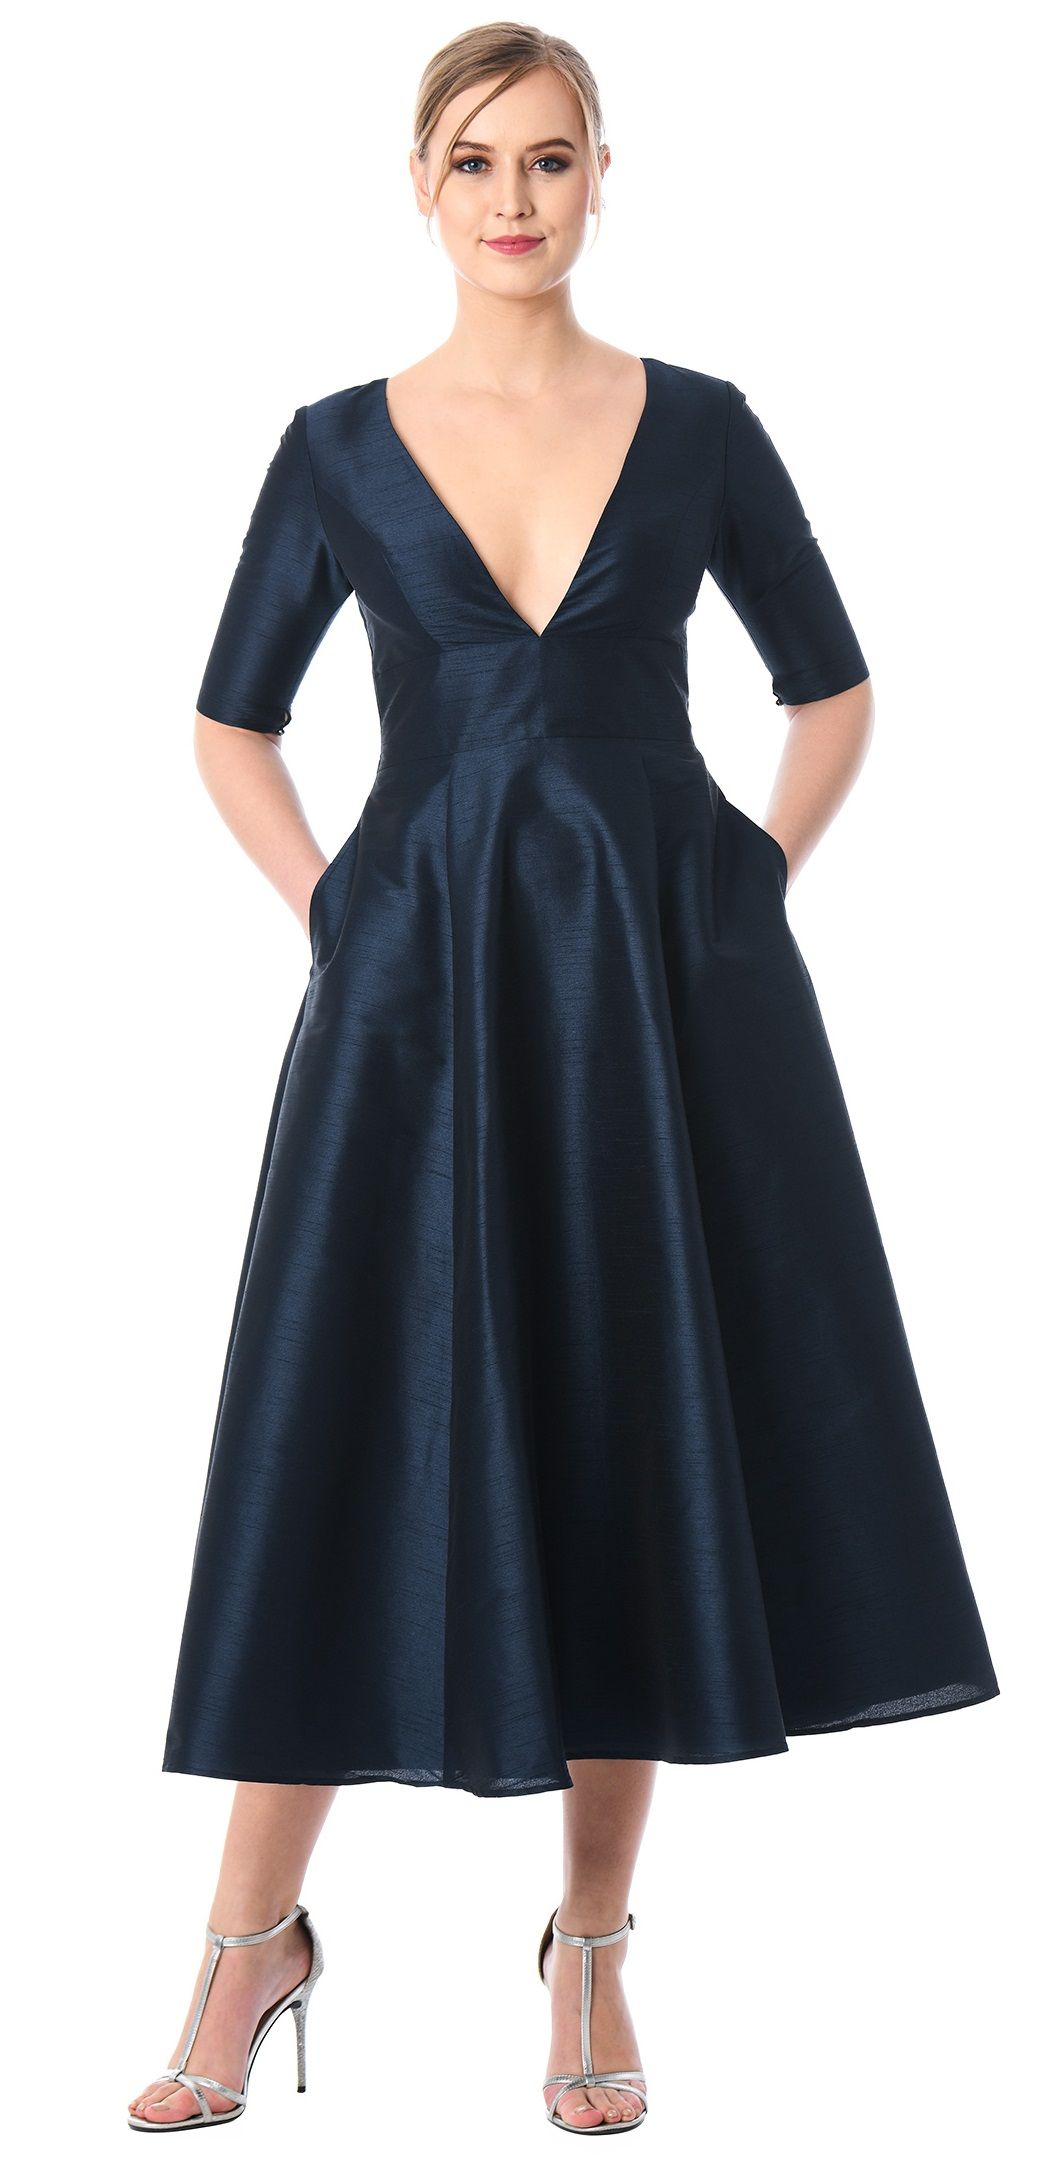 Plus Size Summer Wedding Guest Dress Sleeves Alexawebb 518